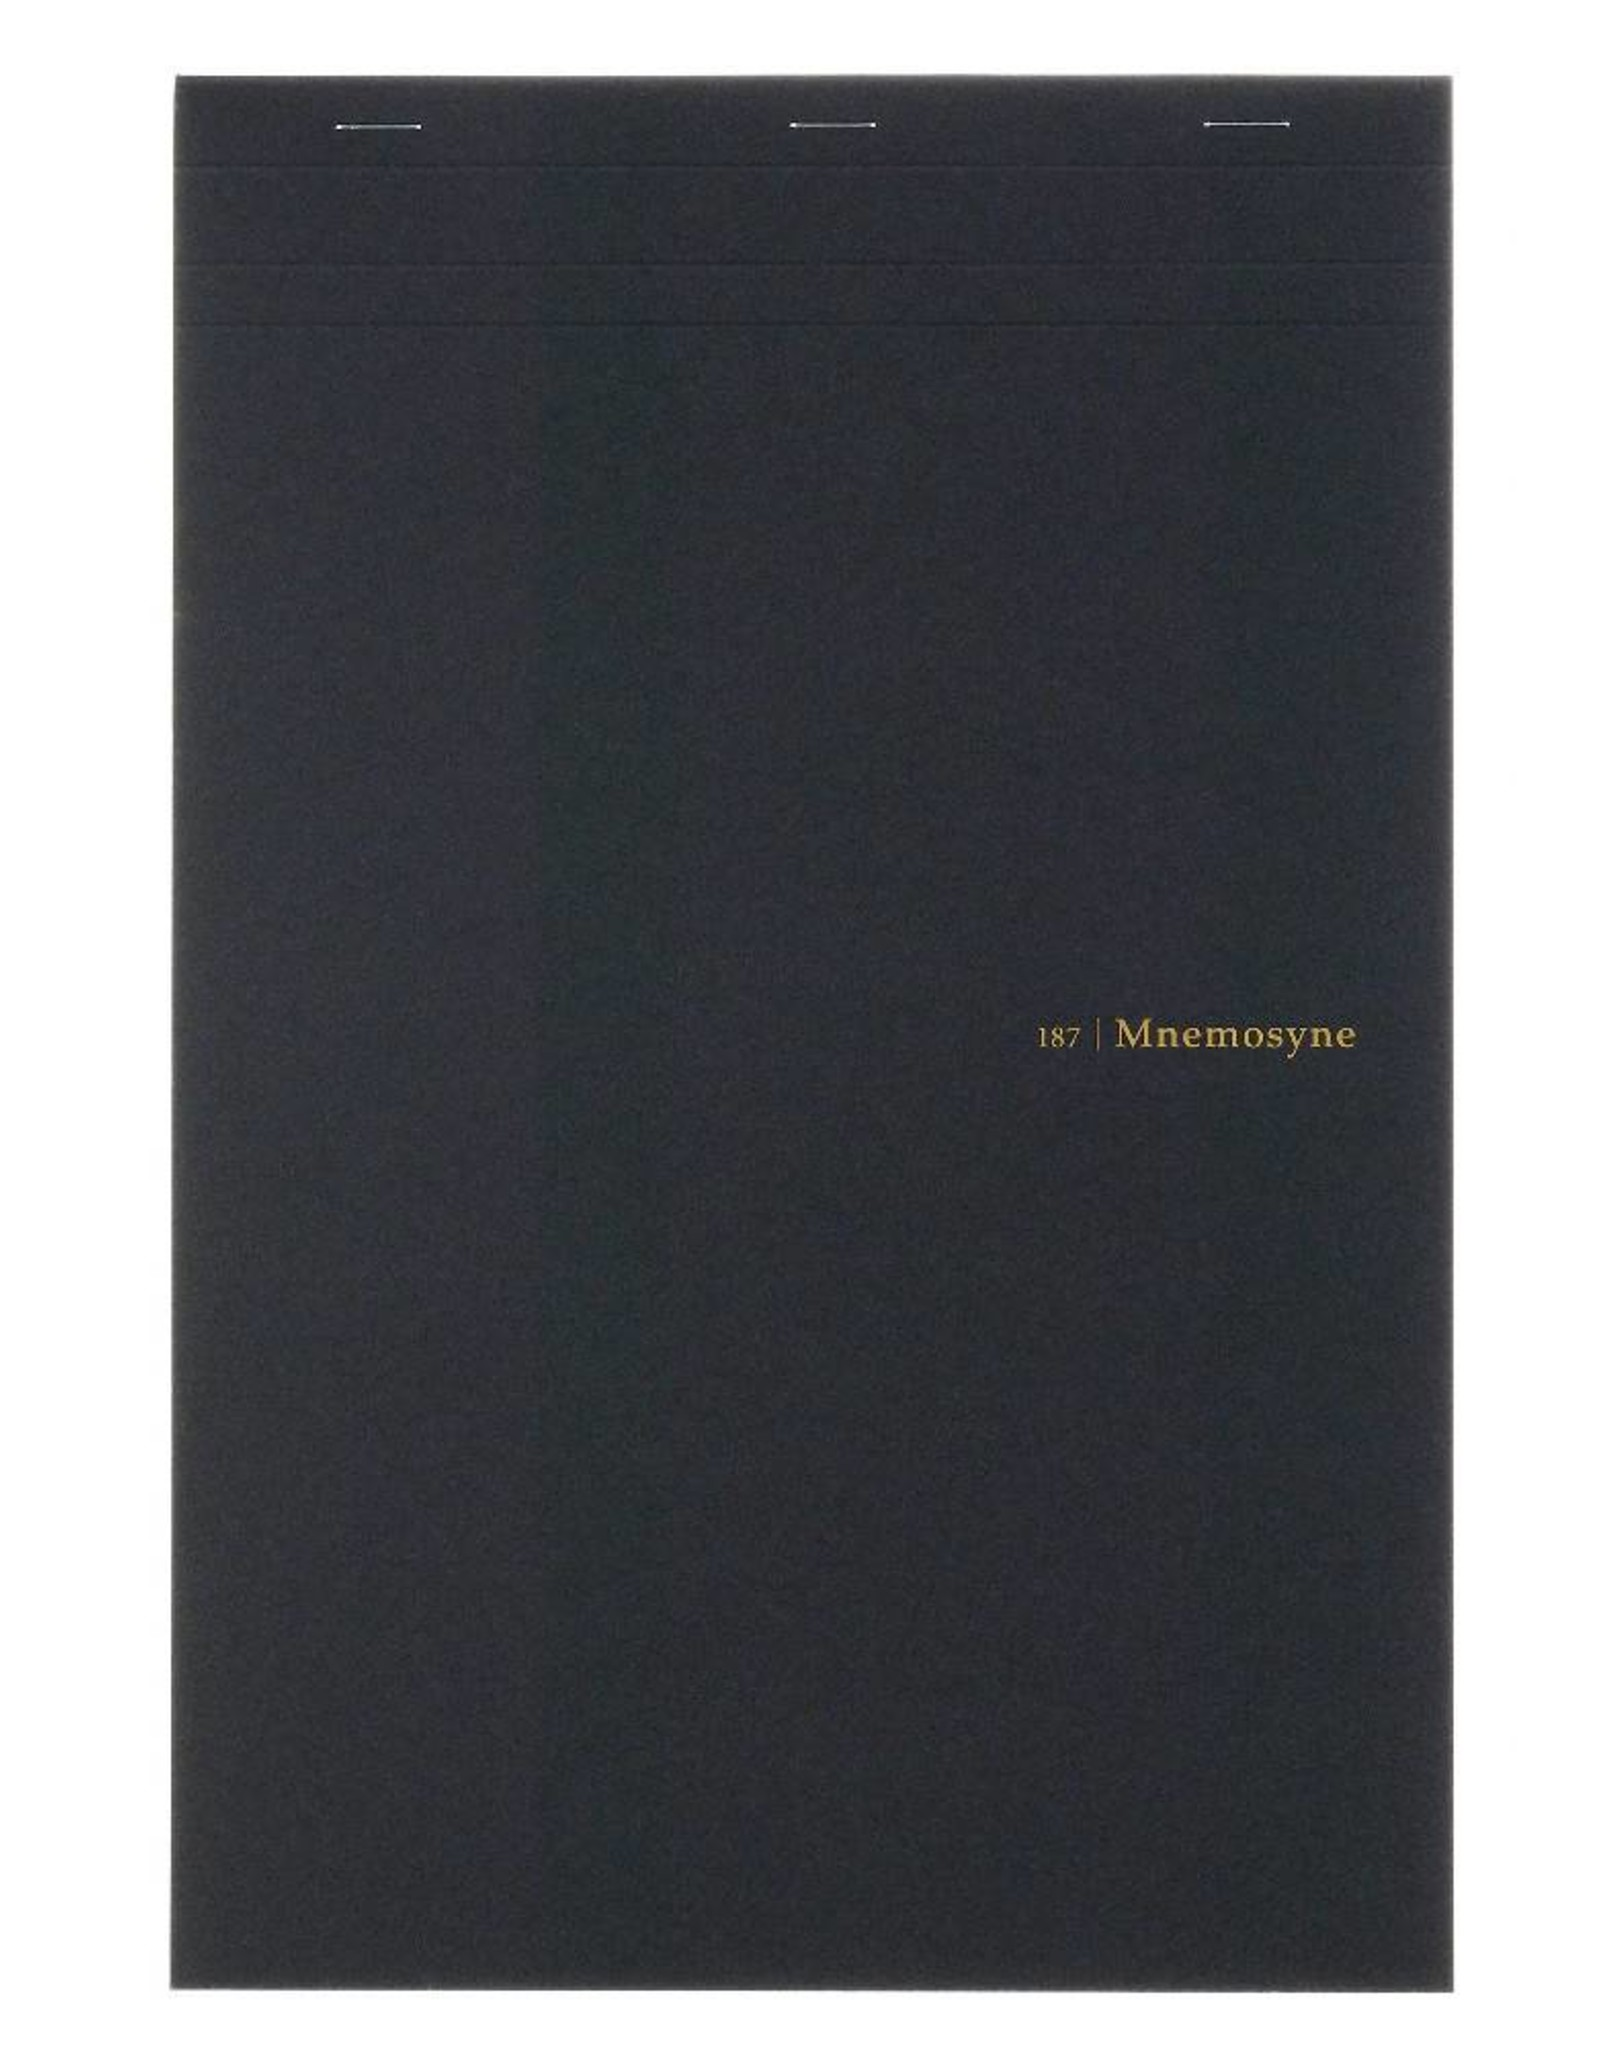 MARUMAN N187A MNEMOSYNE NOTEPAD 5MM SQUARED A4